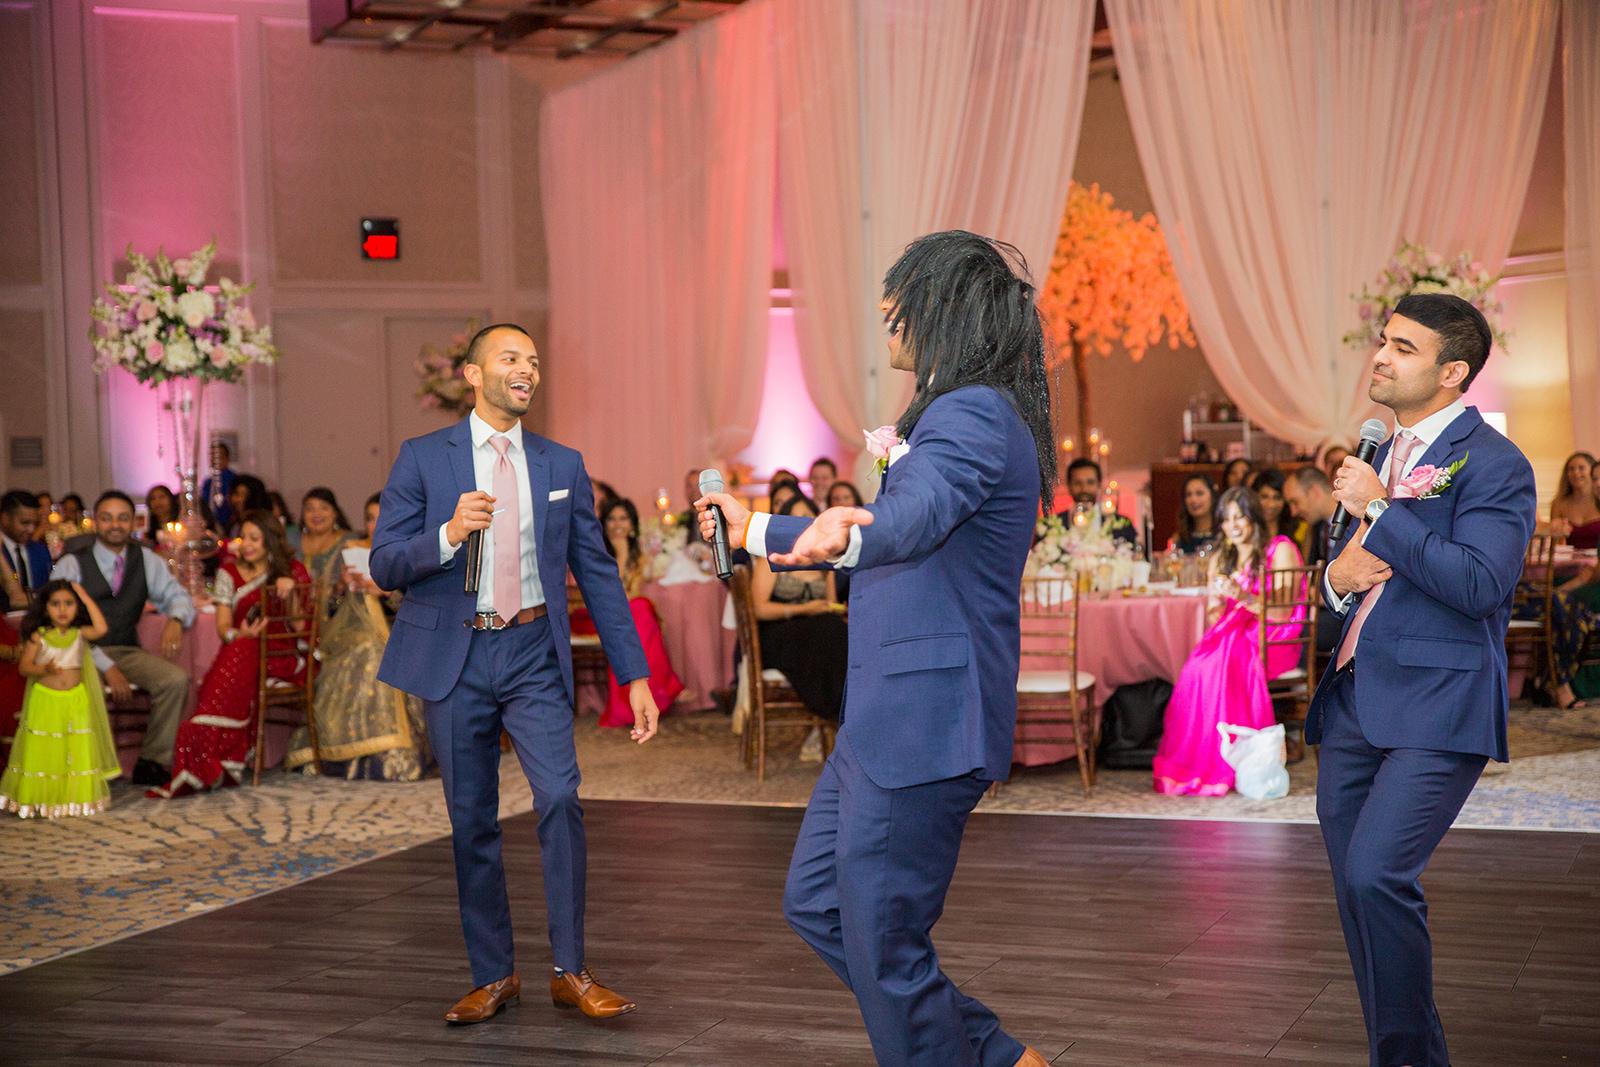 Le Cape Weddings - Sumeet and Chavi - Reception   -46.jpg